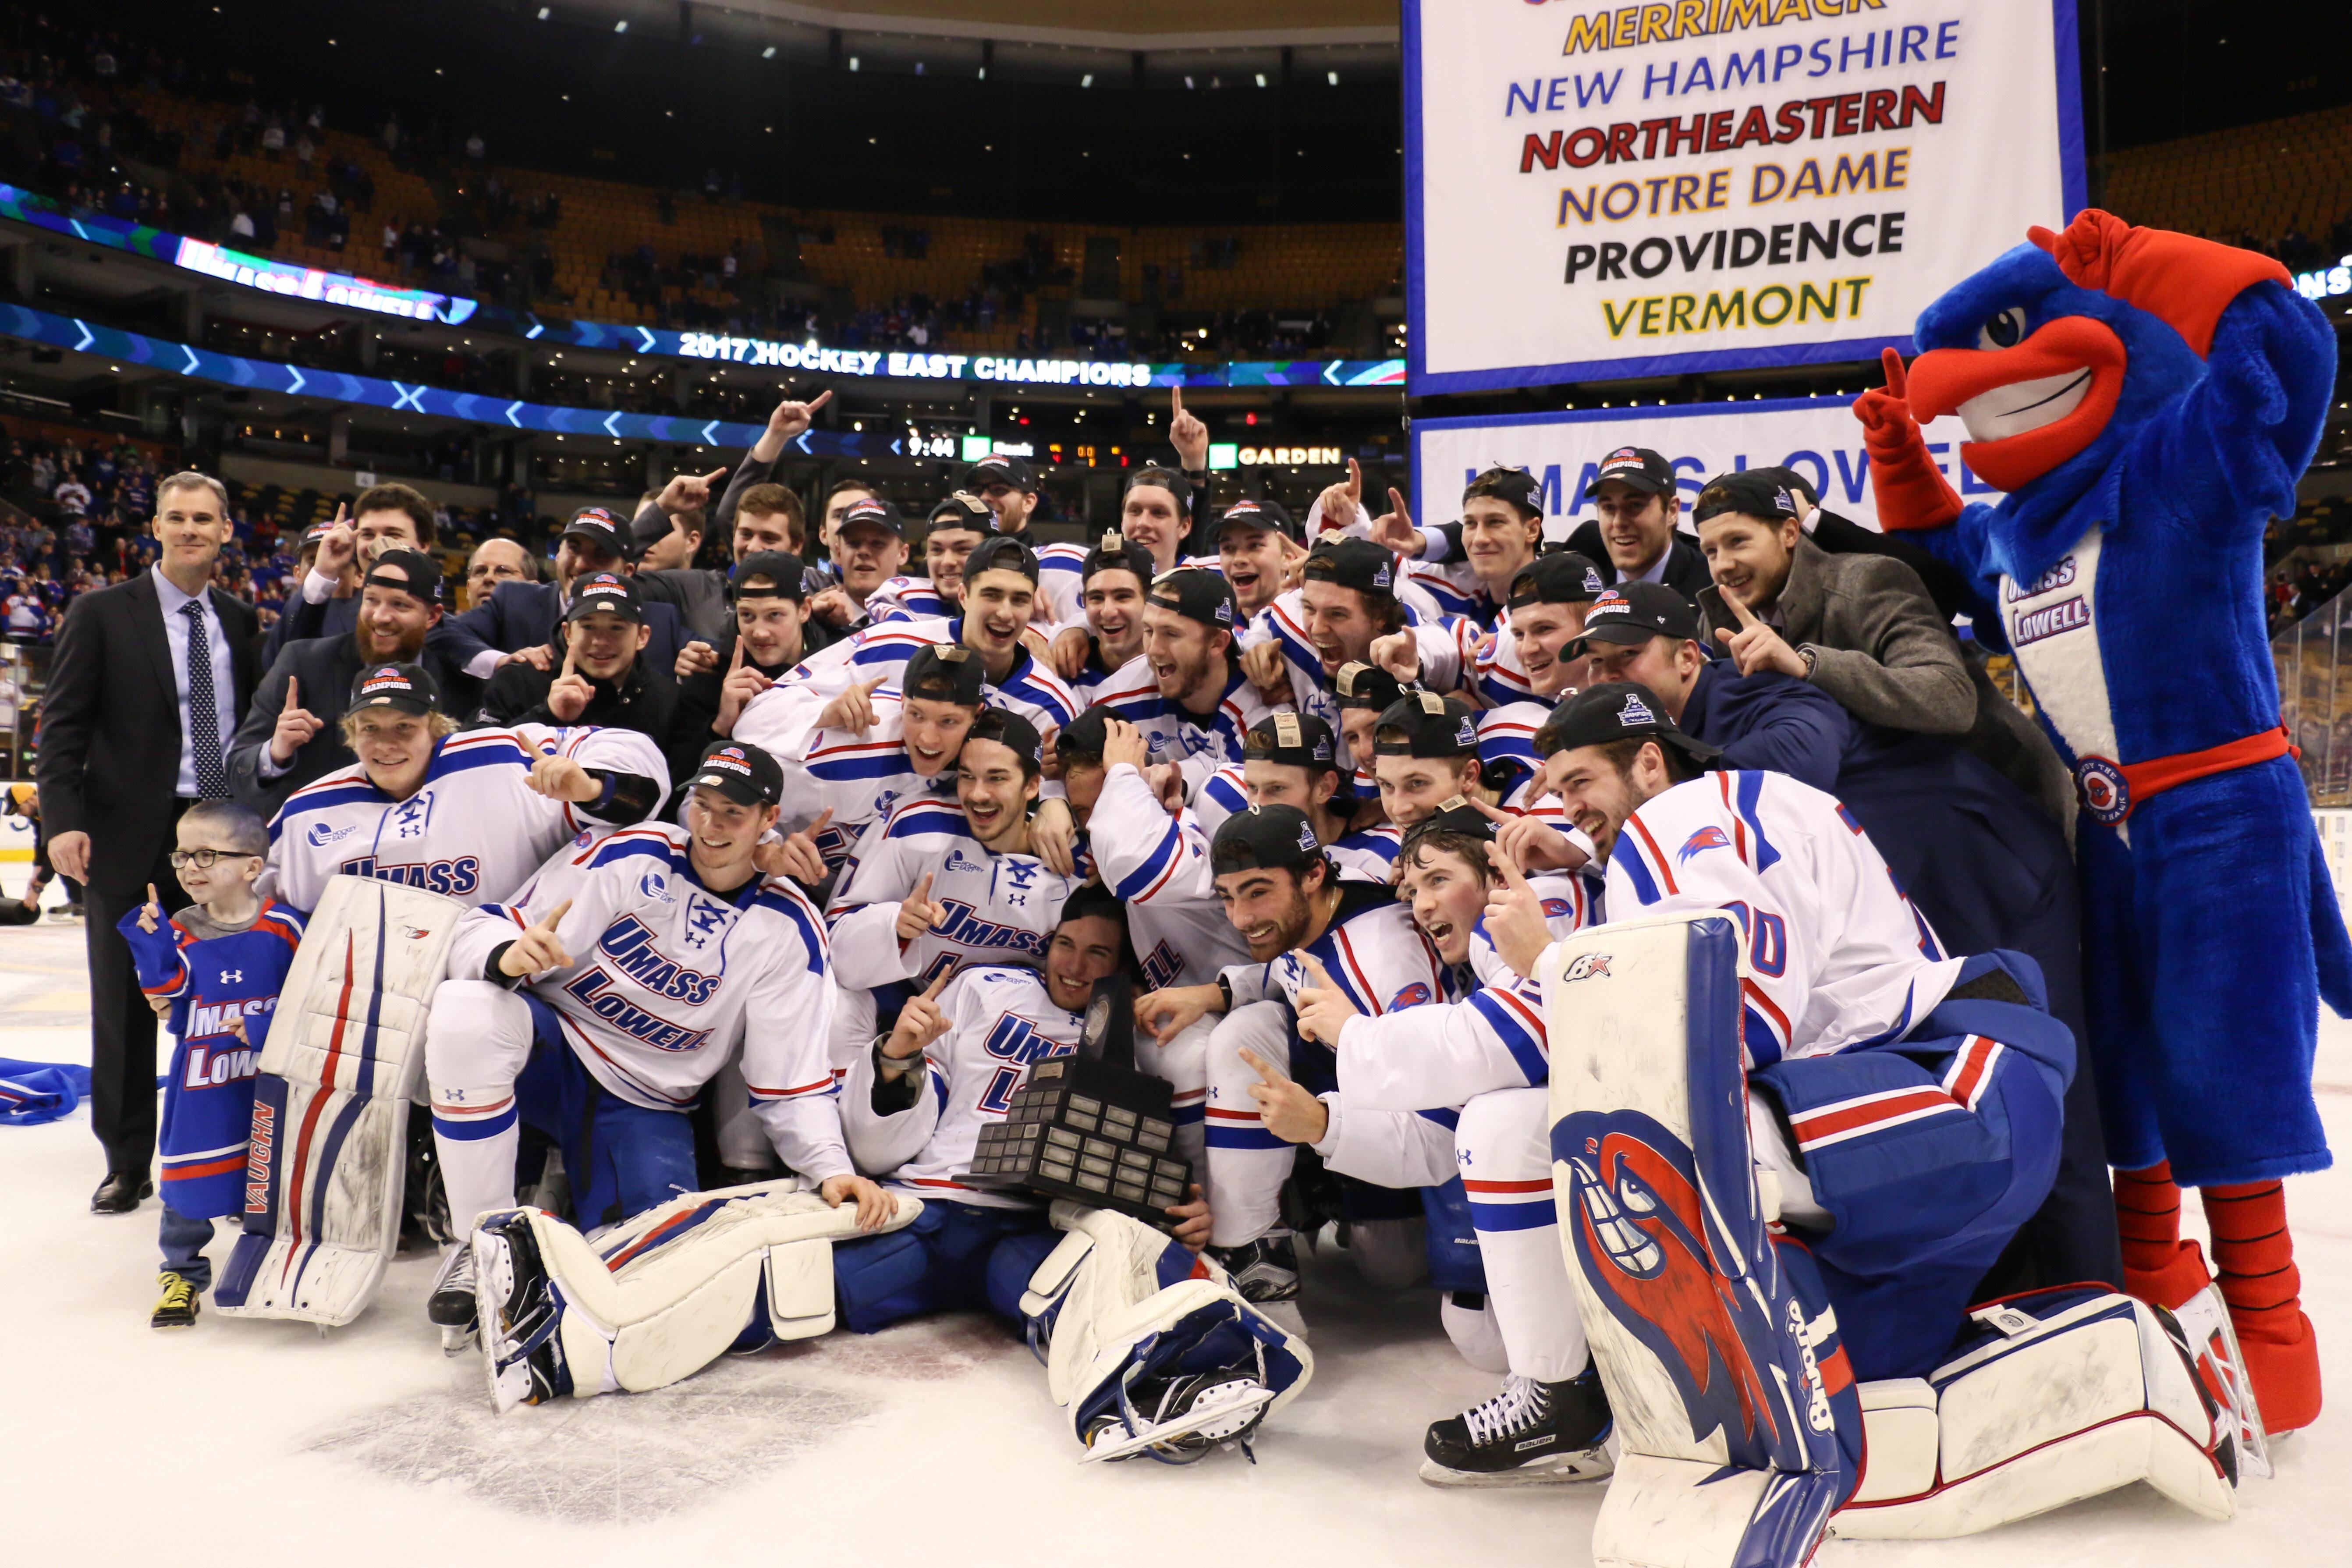 reputable site eee2b 81710 No. 4 River Hawks dismantle Boston College to earn third Hockey East  Championship